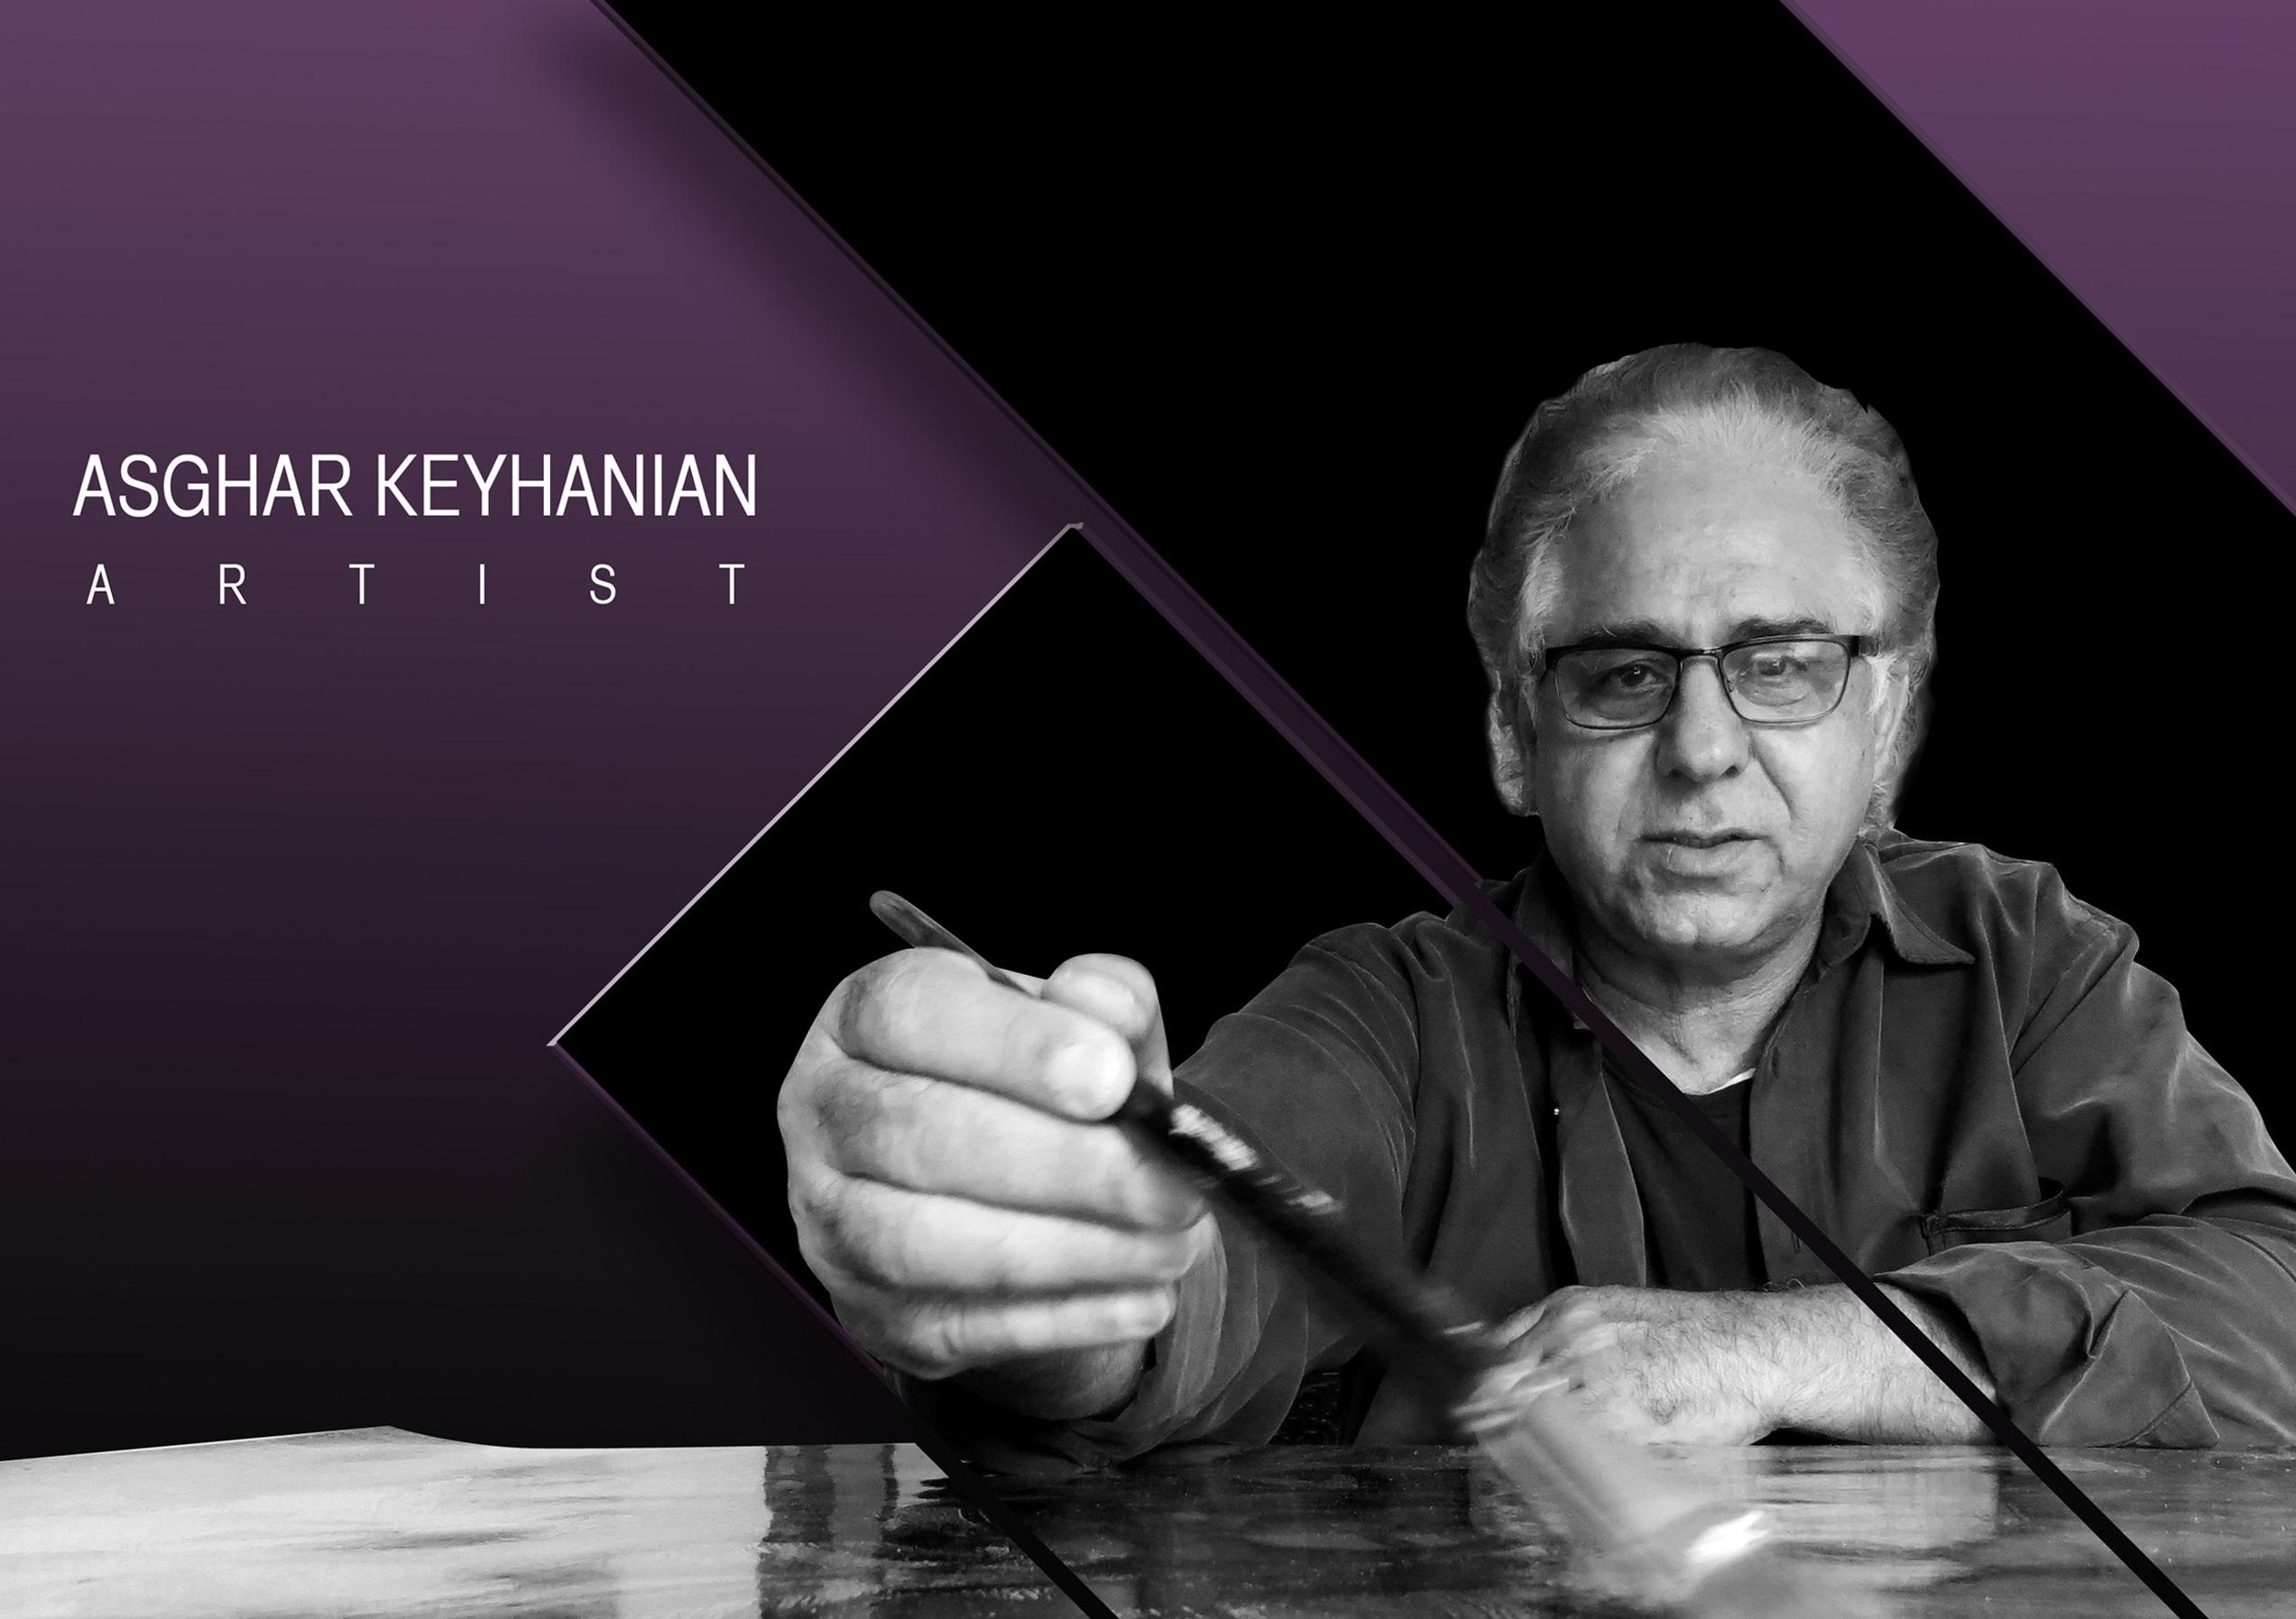 ASGHAR KEYHANIAN HAMBURG